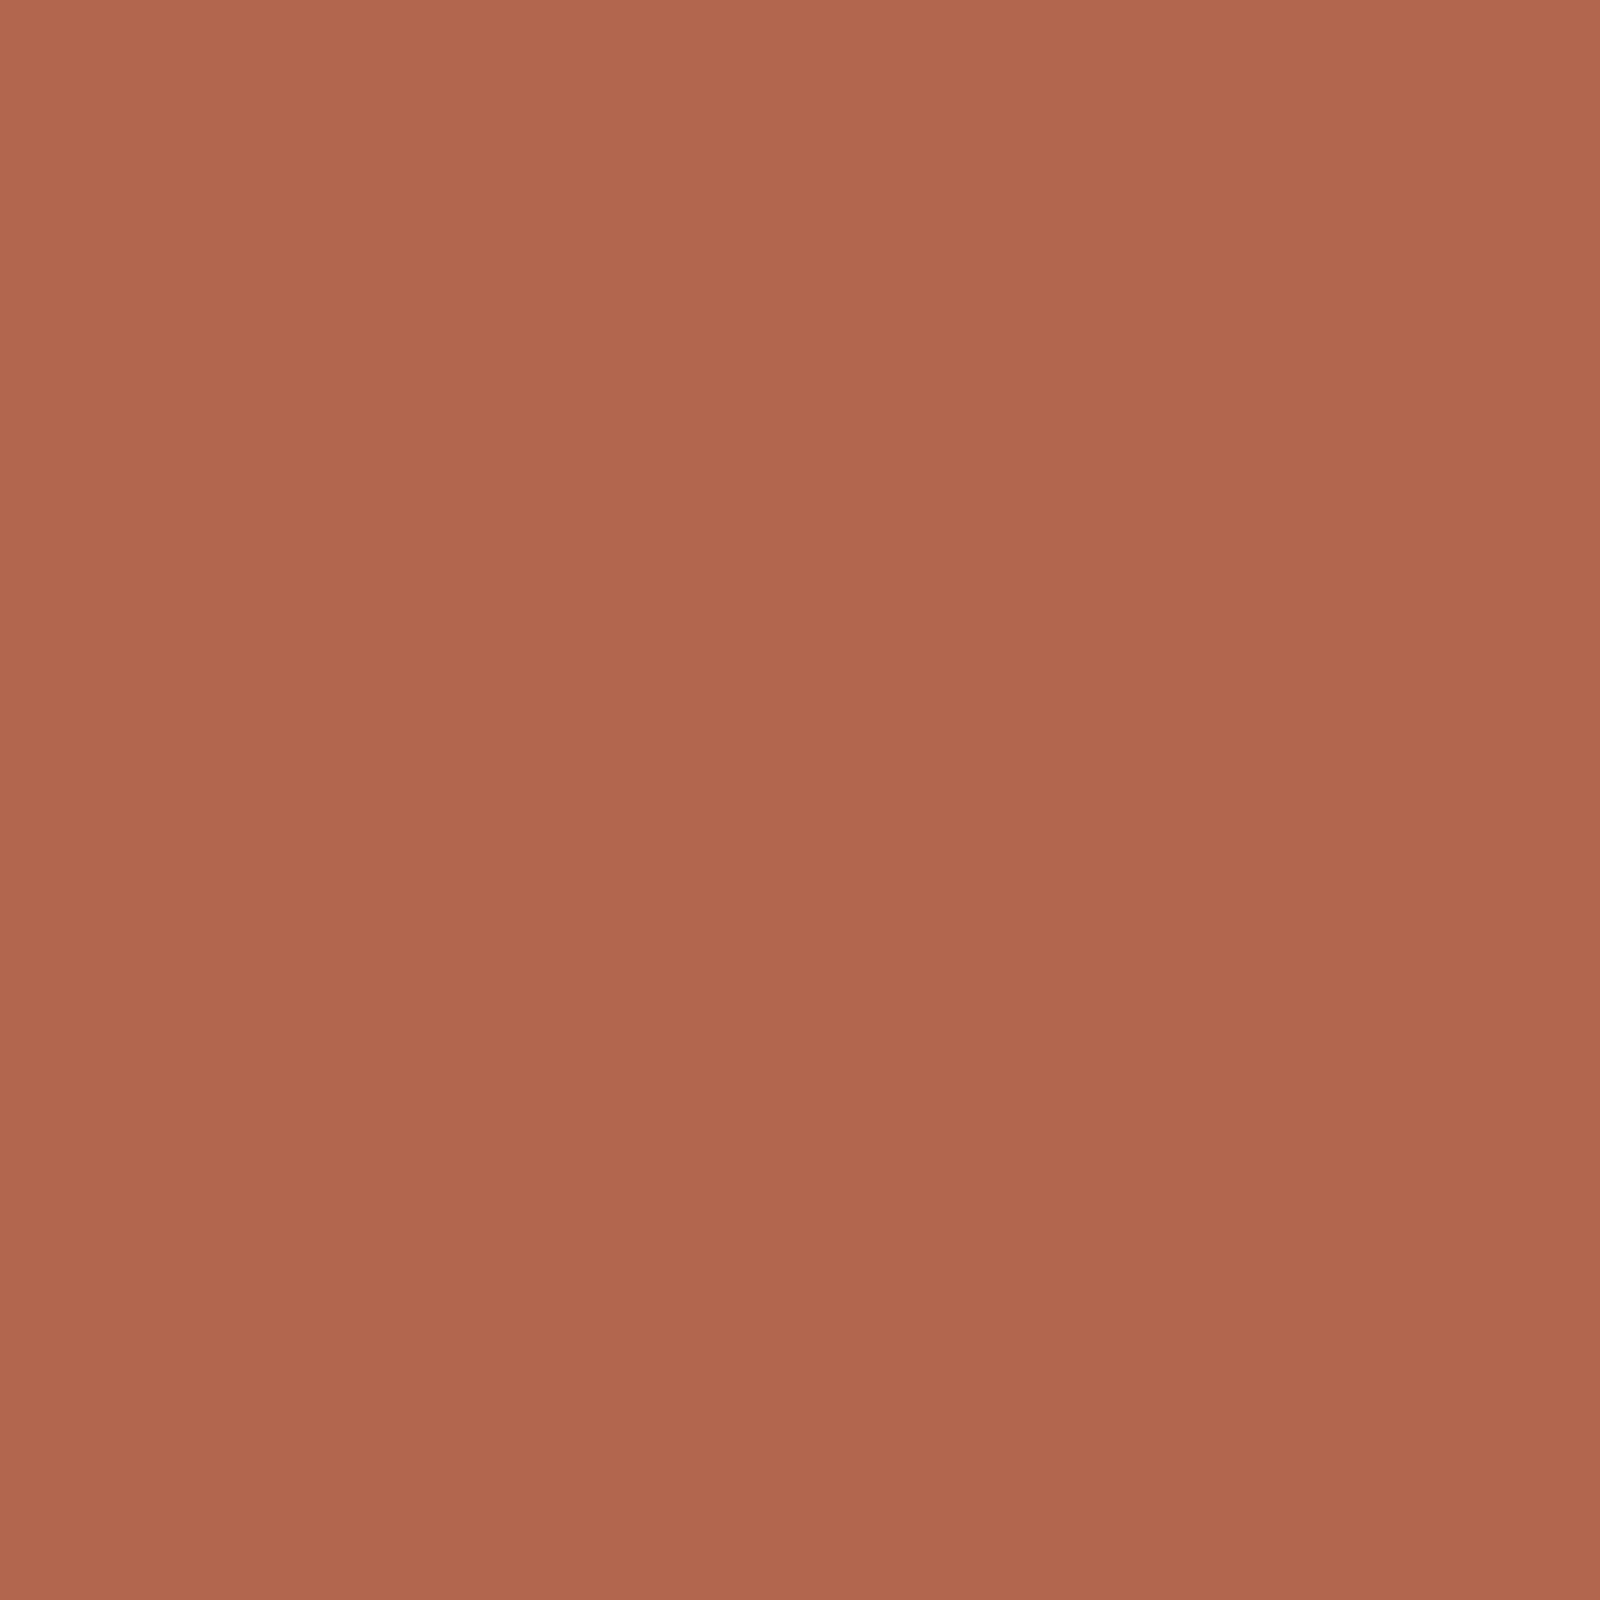 kobra maro hartie